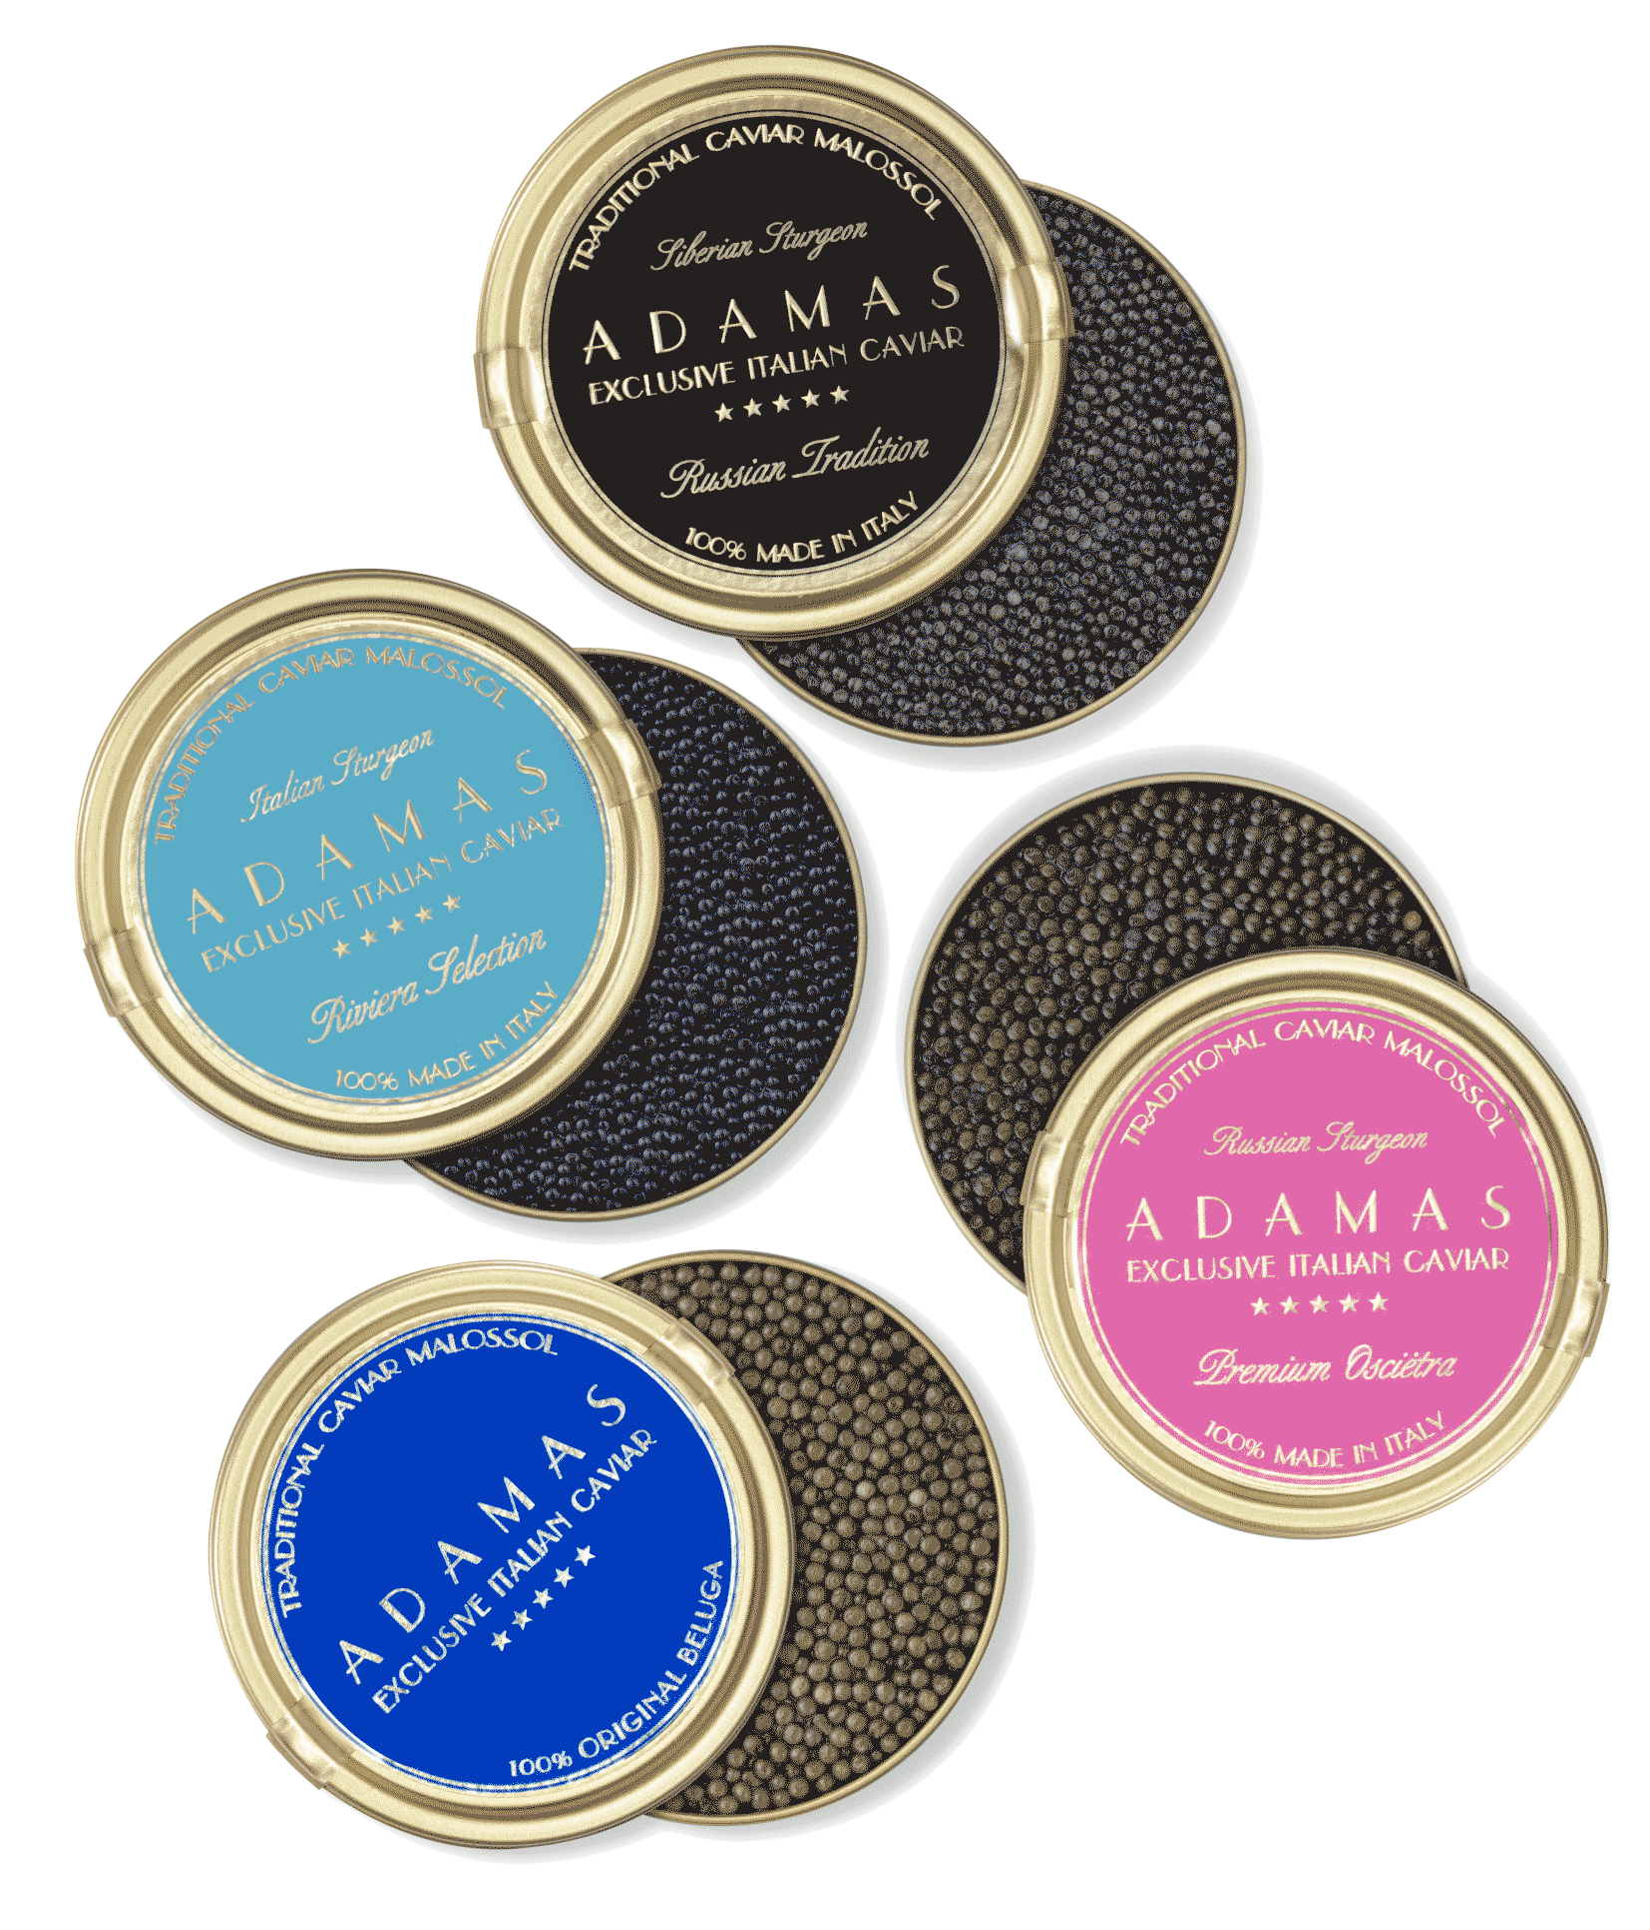 Adamas Caviar - Caviale premium